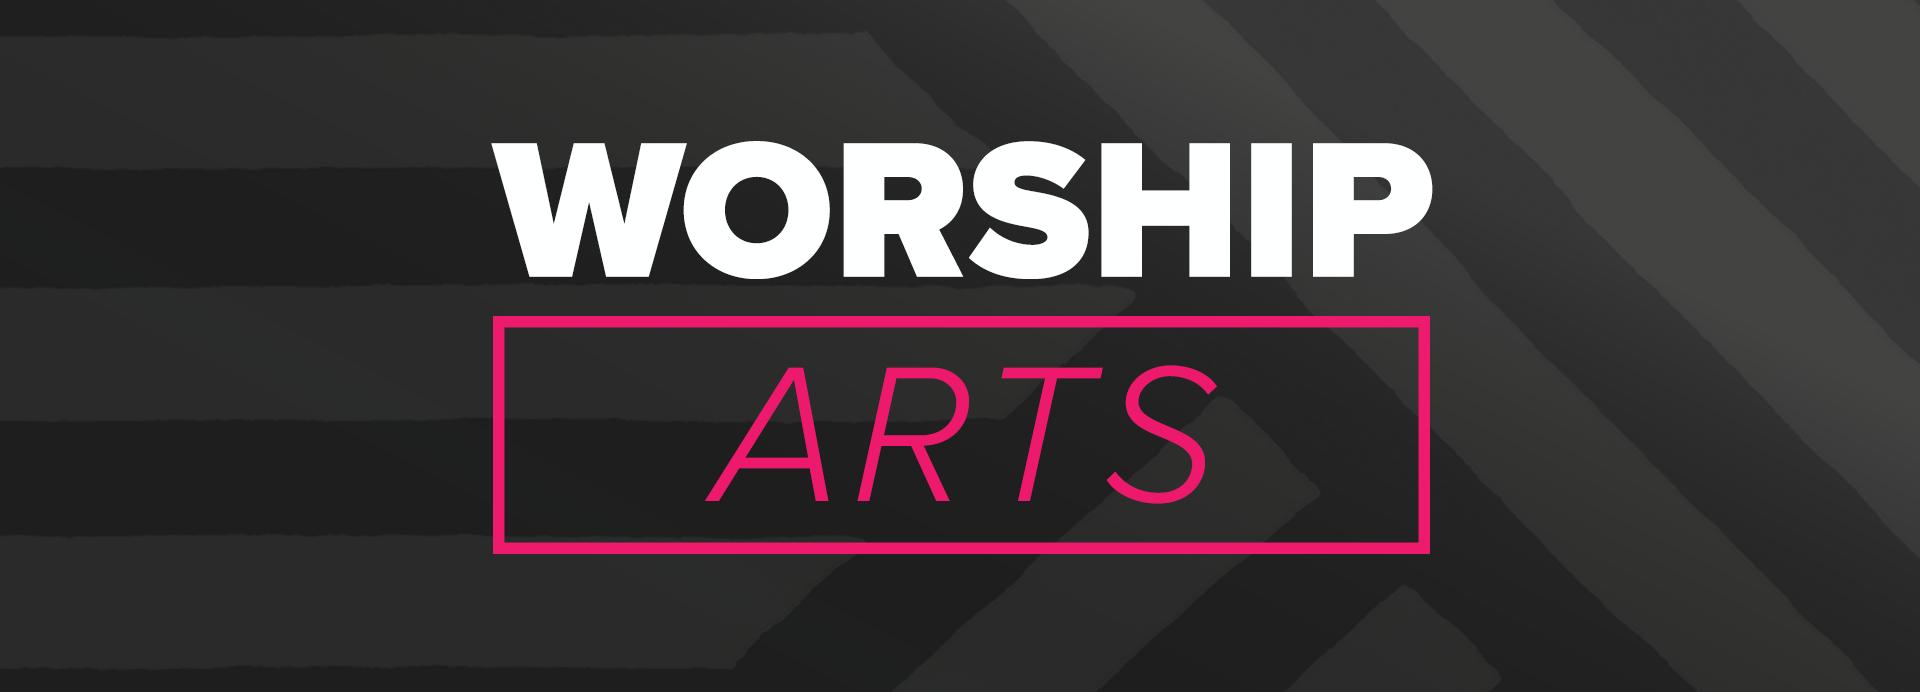 WorshipArtsBanner.png